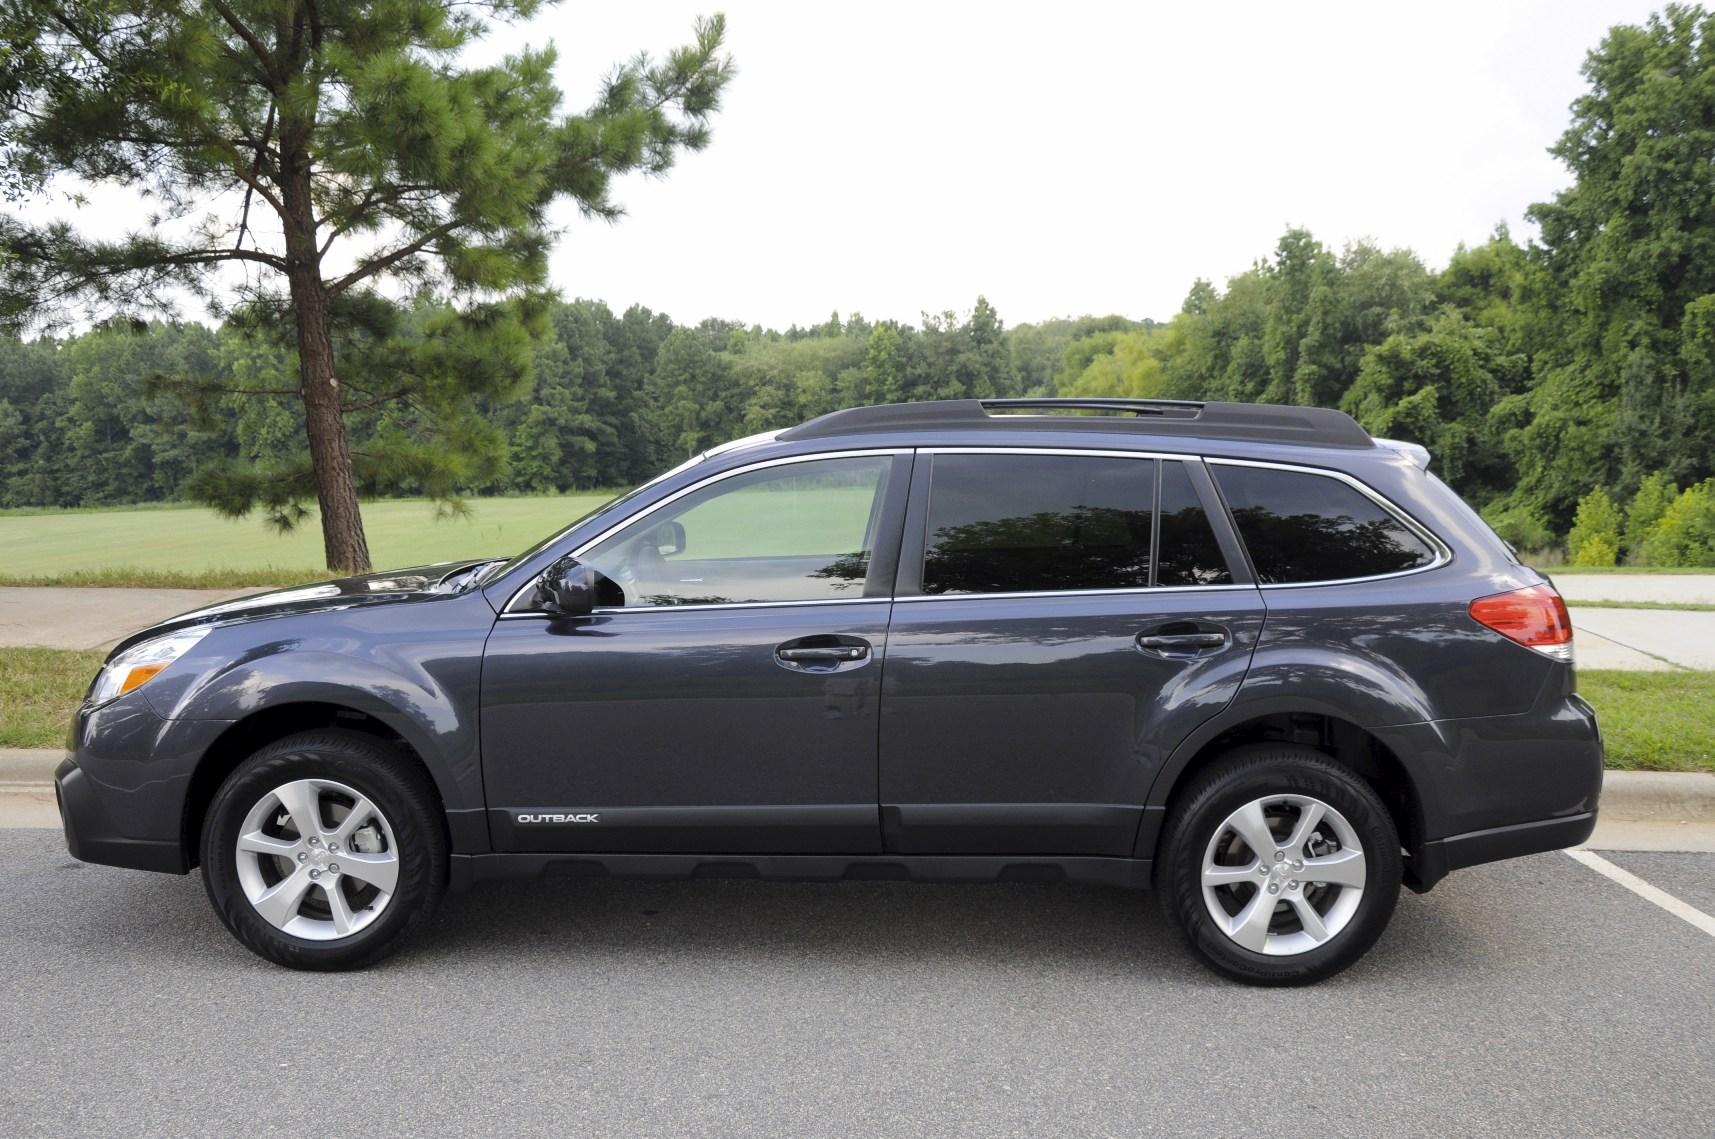 Weather Car Mats >> 2013 Outback Limited ! - Subaru Outback - Subaru Outback ...